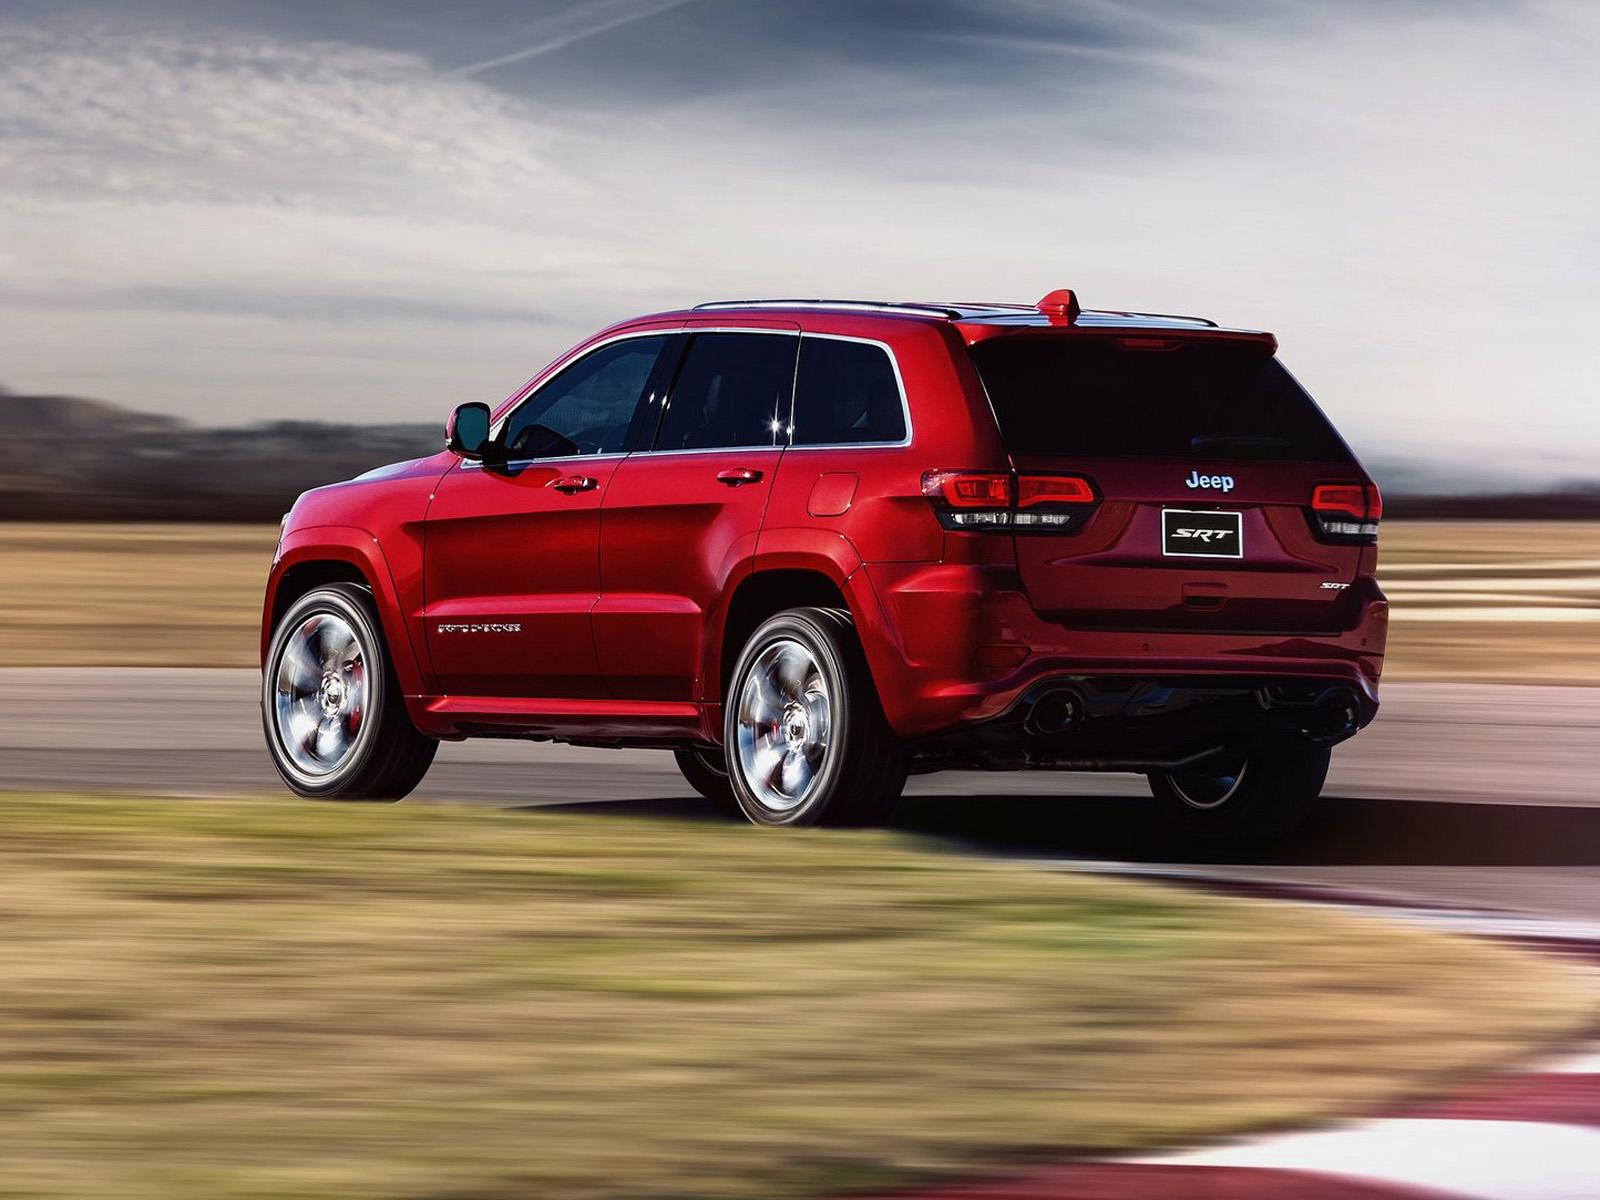 vista trasera jeep grand cherokee movimiento